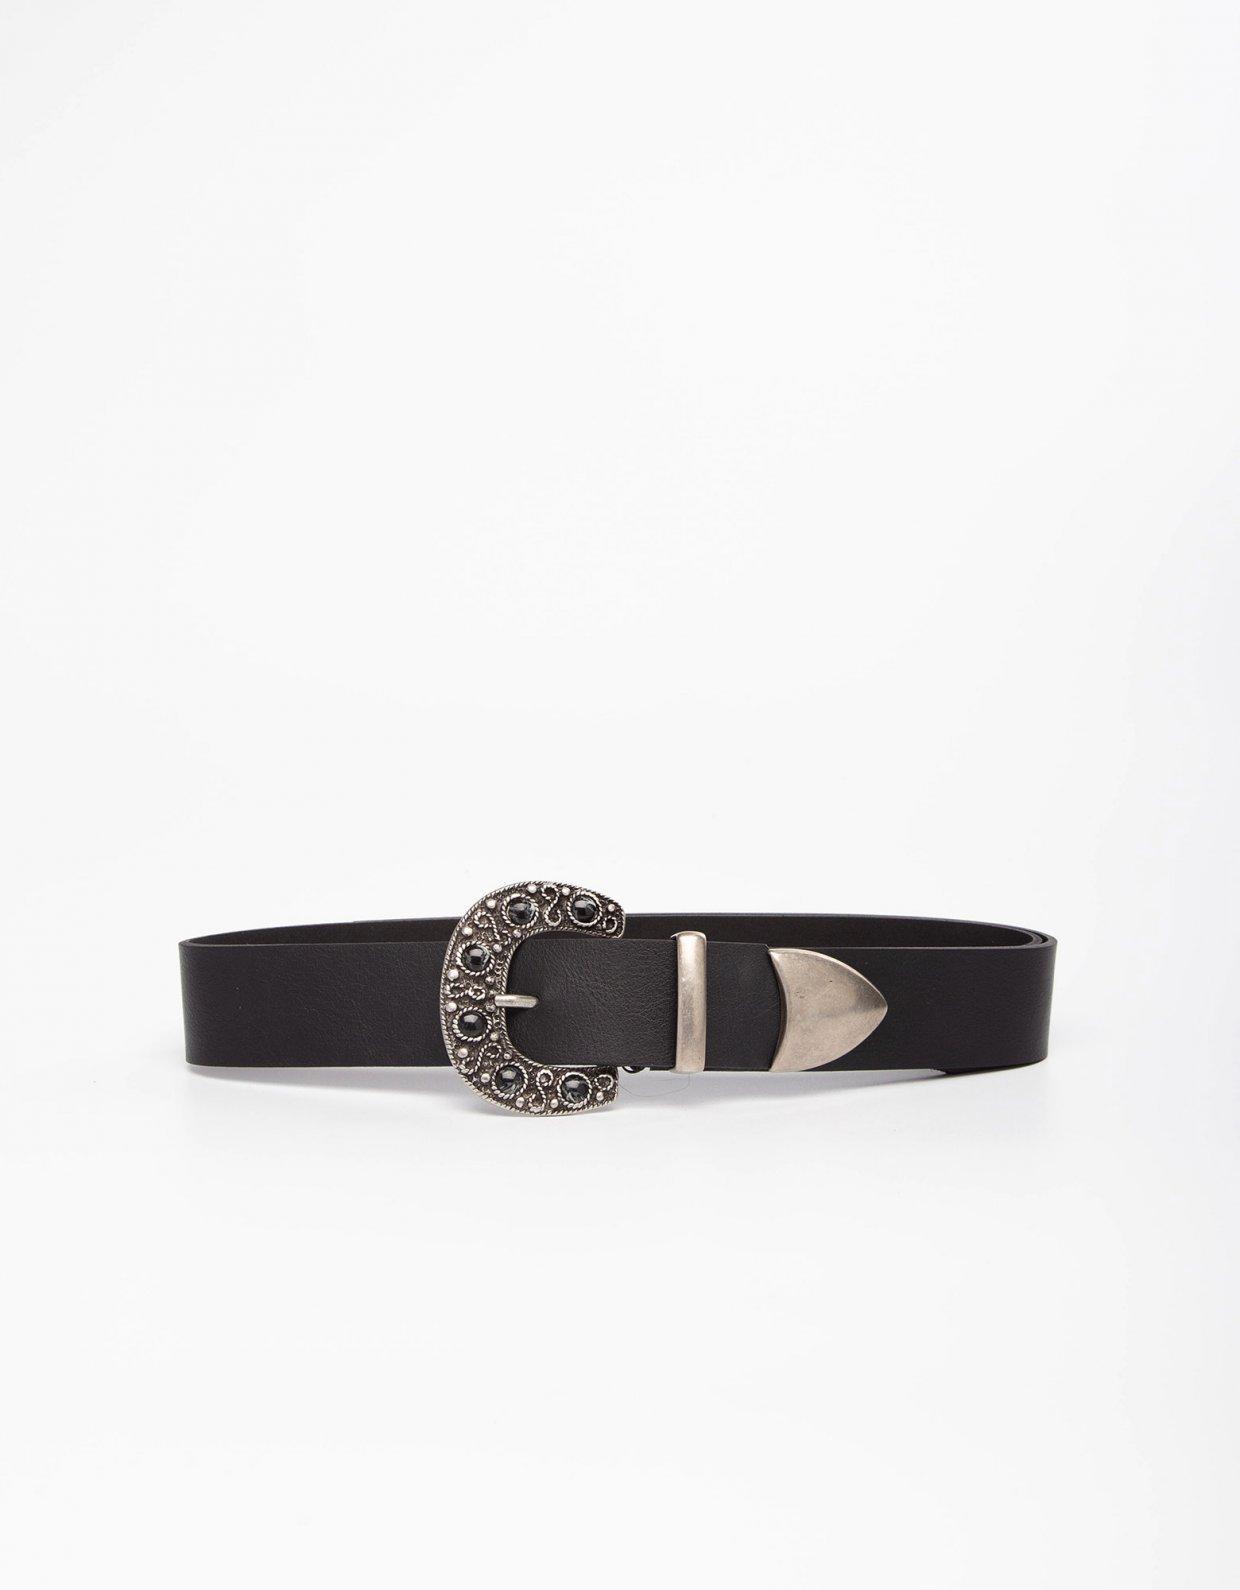 Individual Art Leather Ocean soul black belt